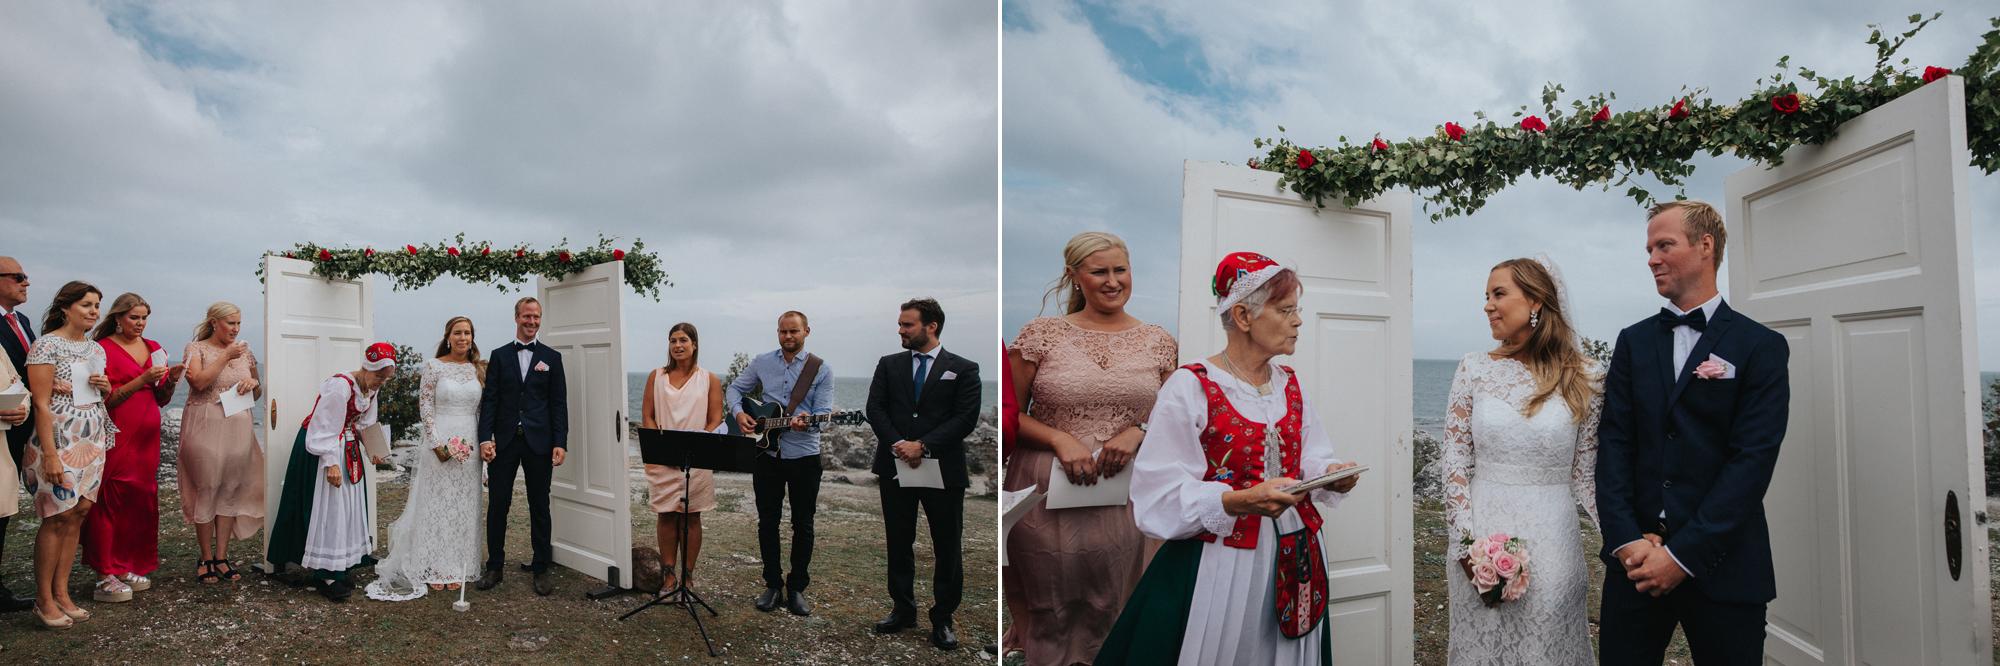 032-bröllopsfotograf-folhammar-gotland-neas-fotografi.jpg